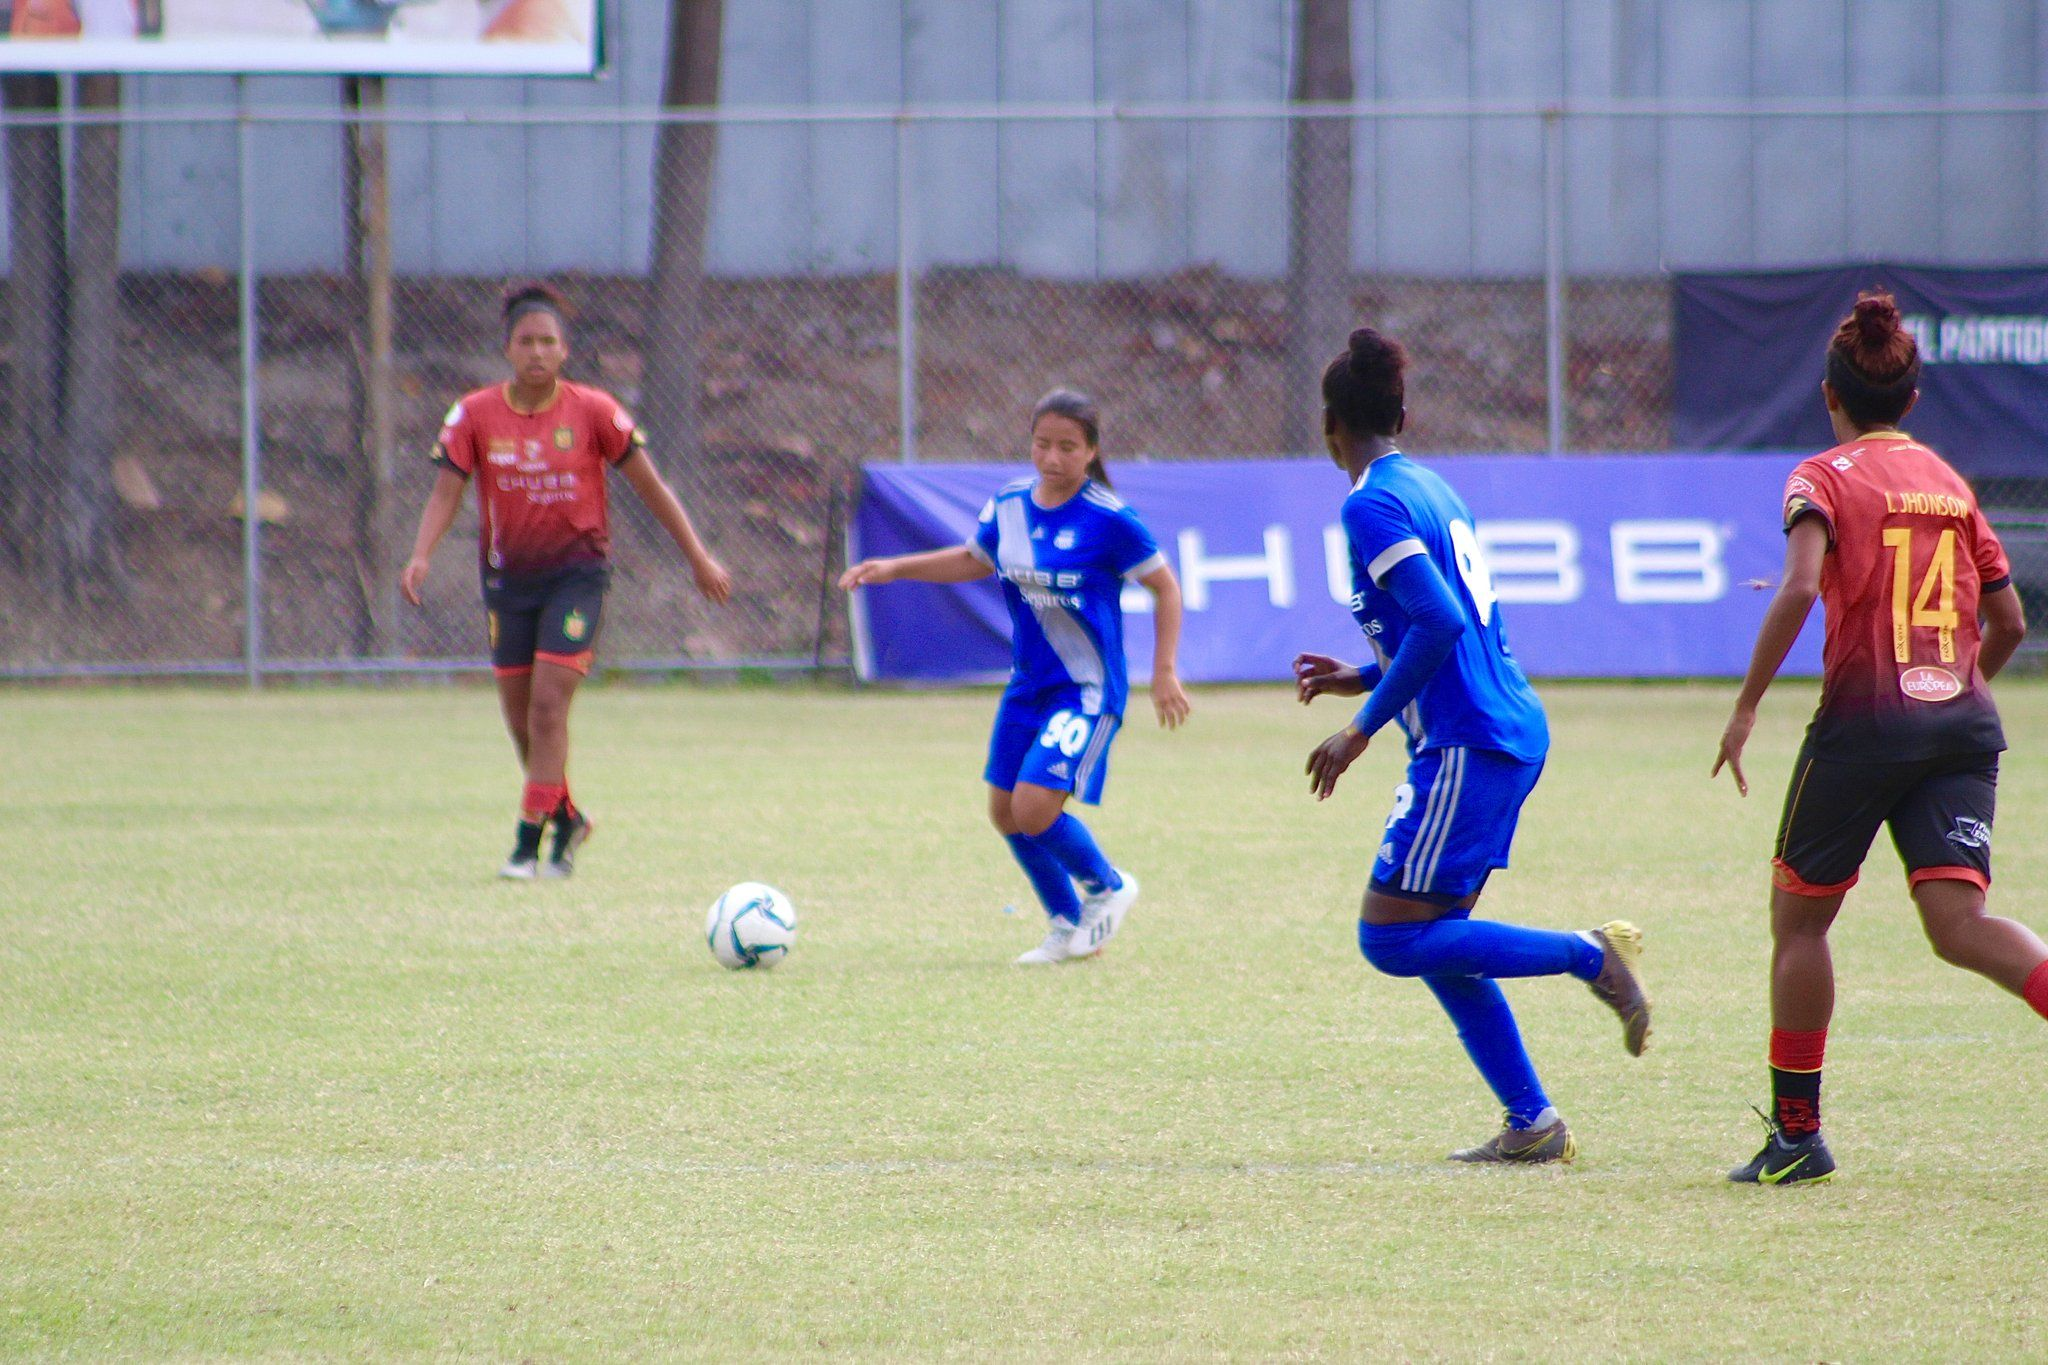 Emelec 1-5 Deportivo Cuenca